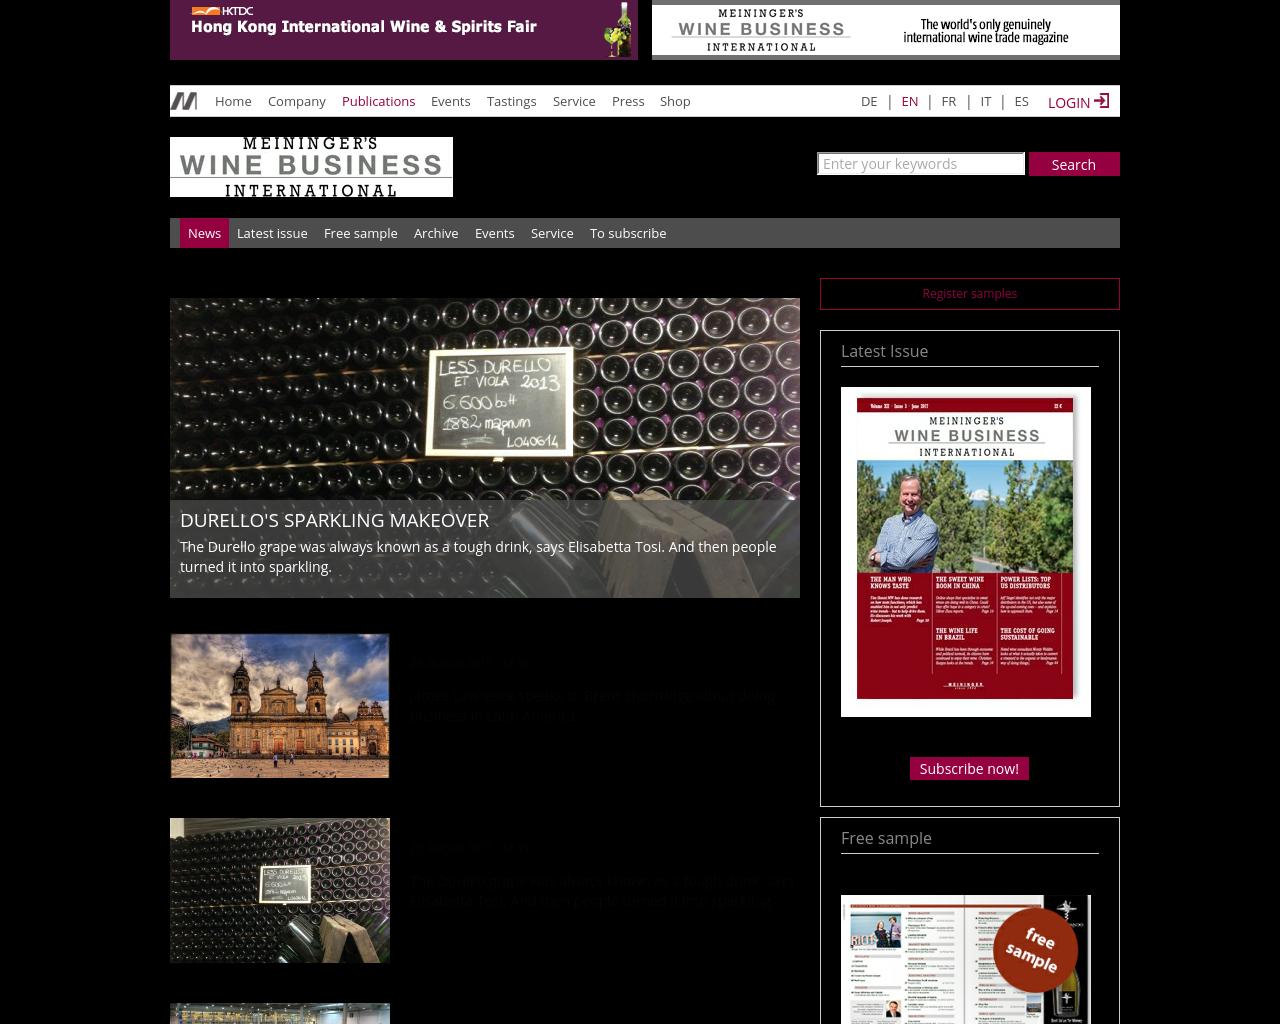 Meininger-Wine-Business-International-Advertising-Reviews-Pricing